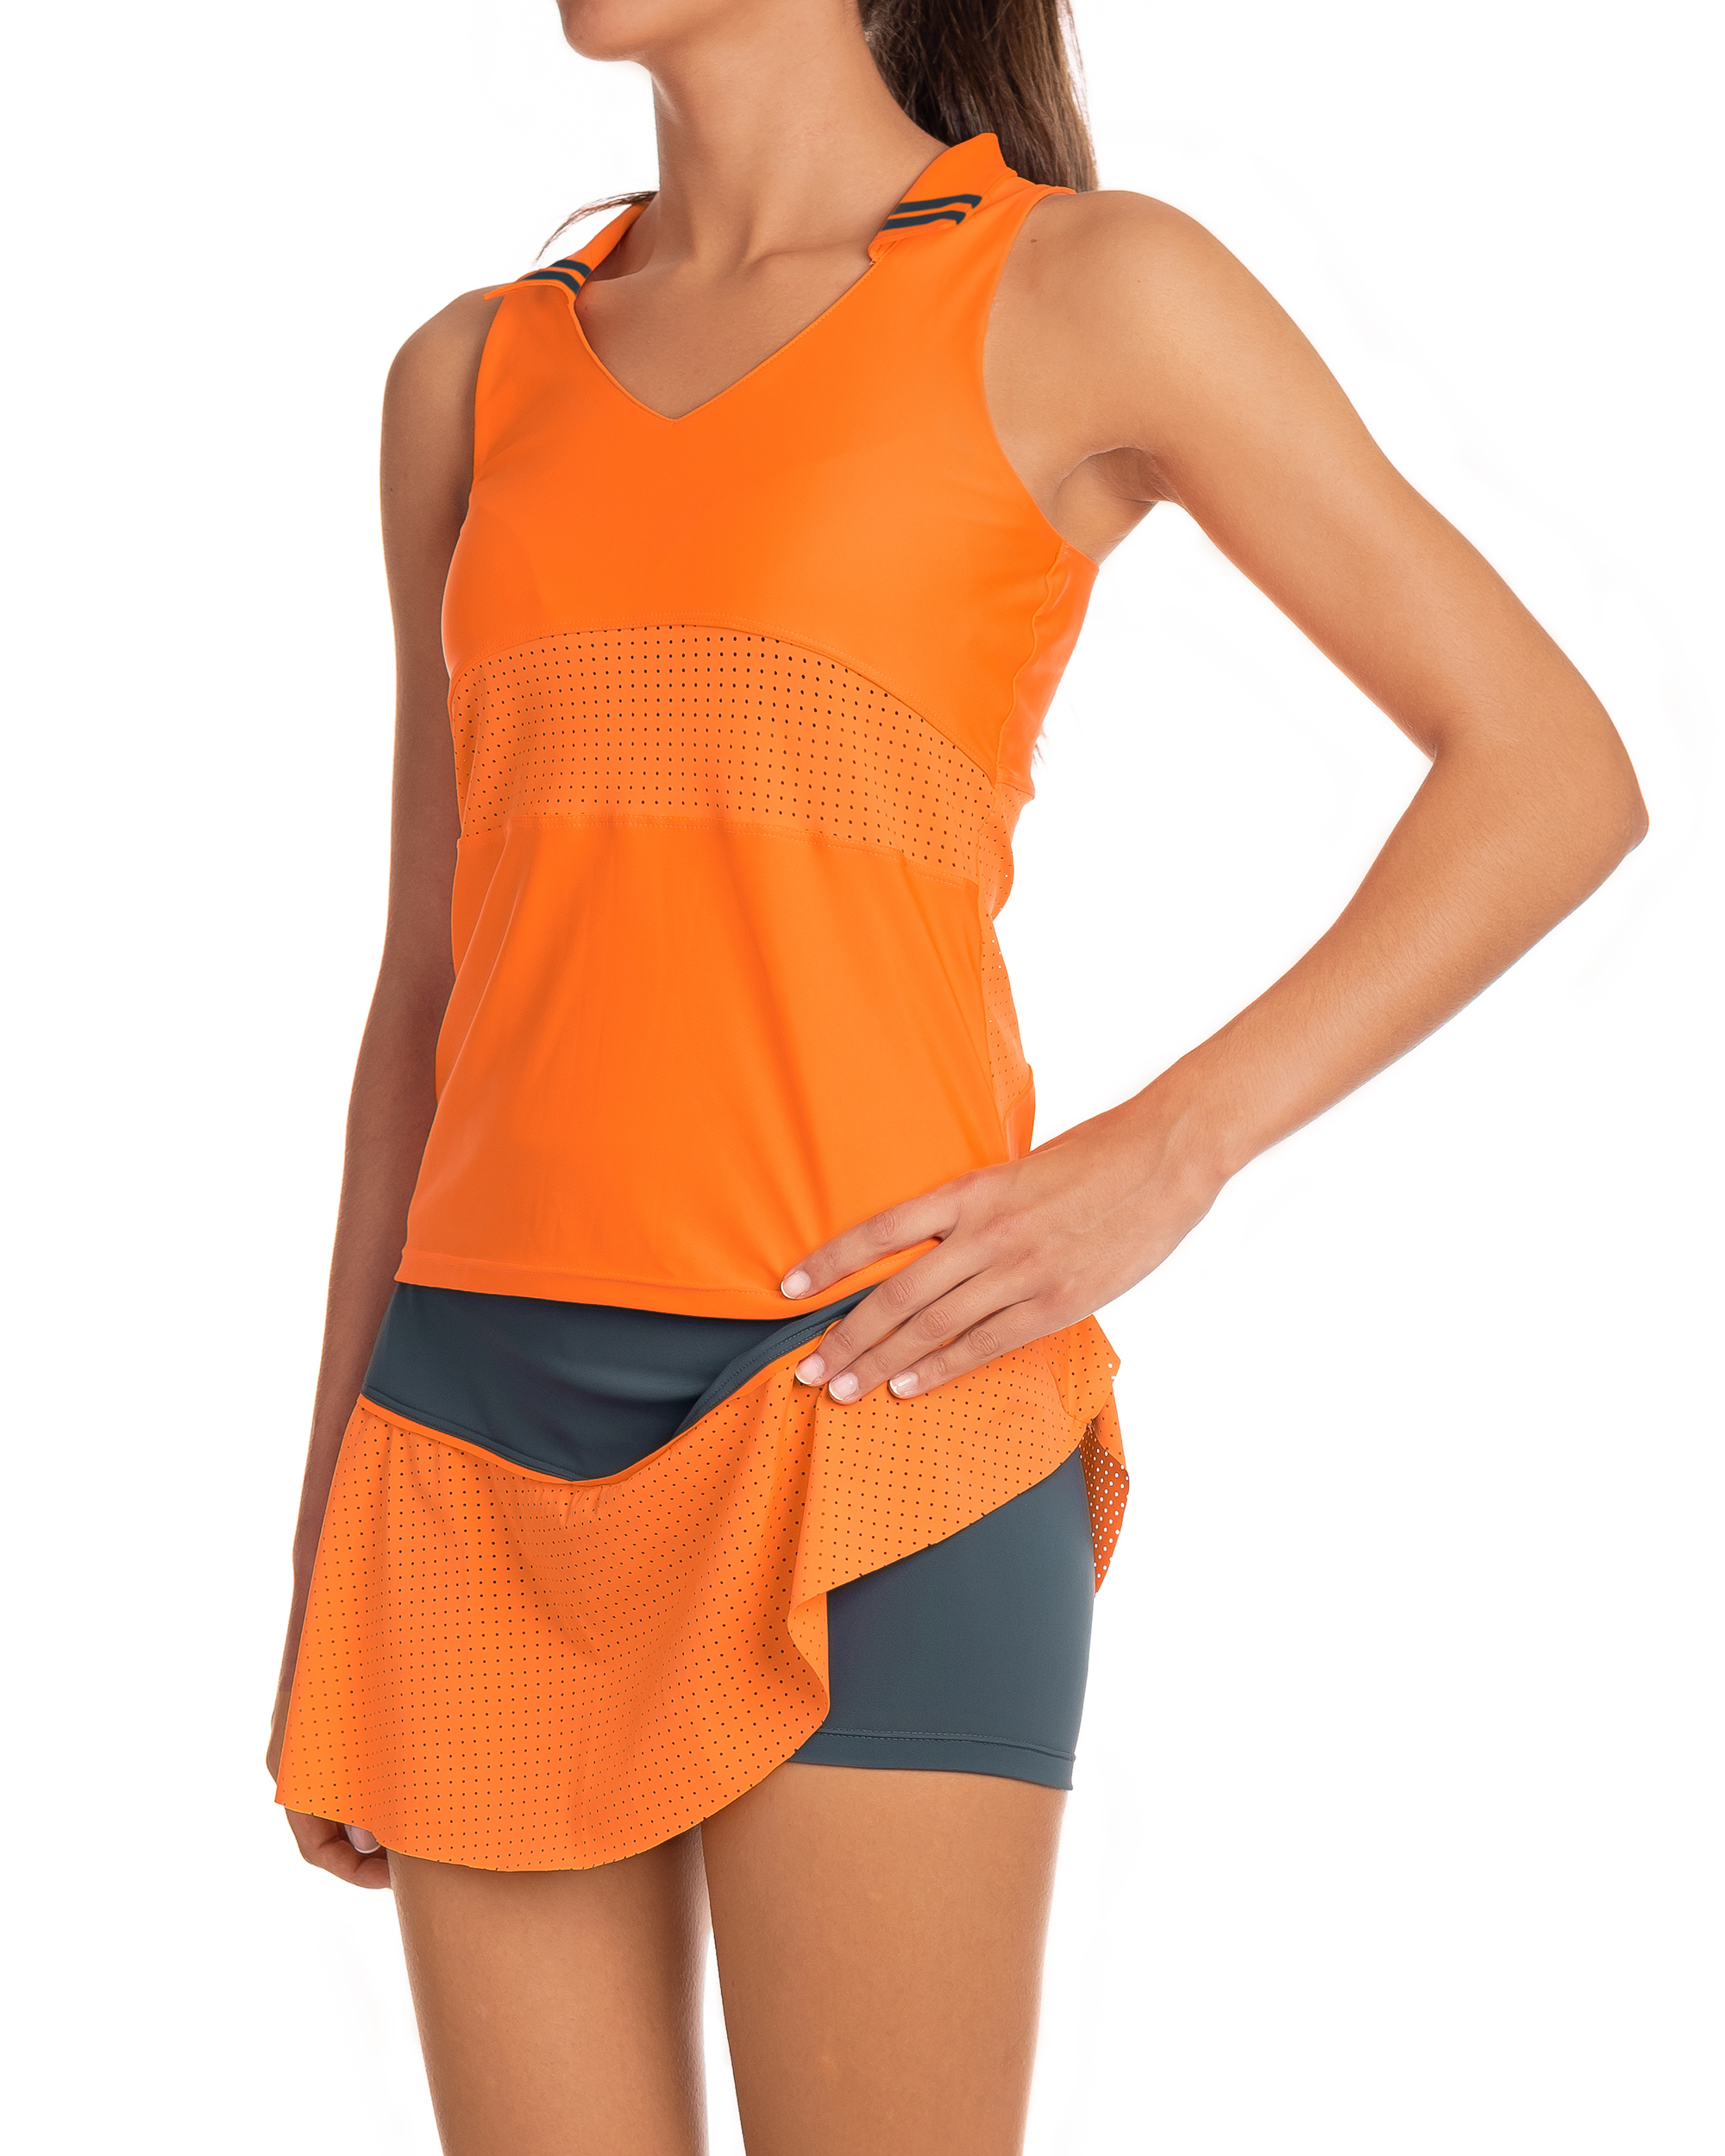 Deportiva Mujer Naranja Naranja Camiseta Mujer CxBordeW